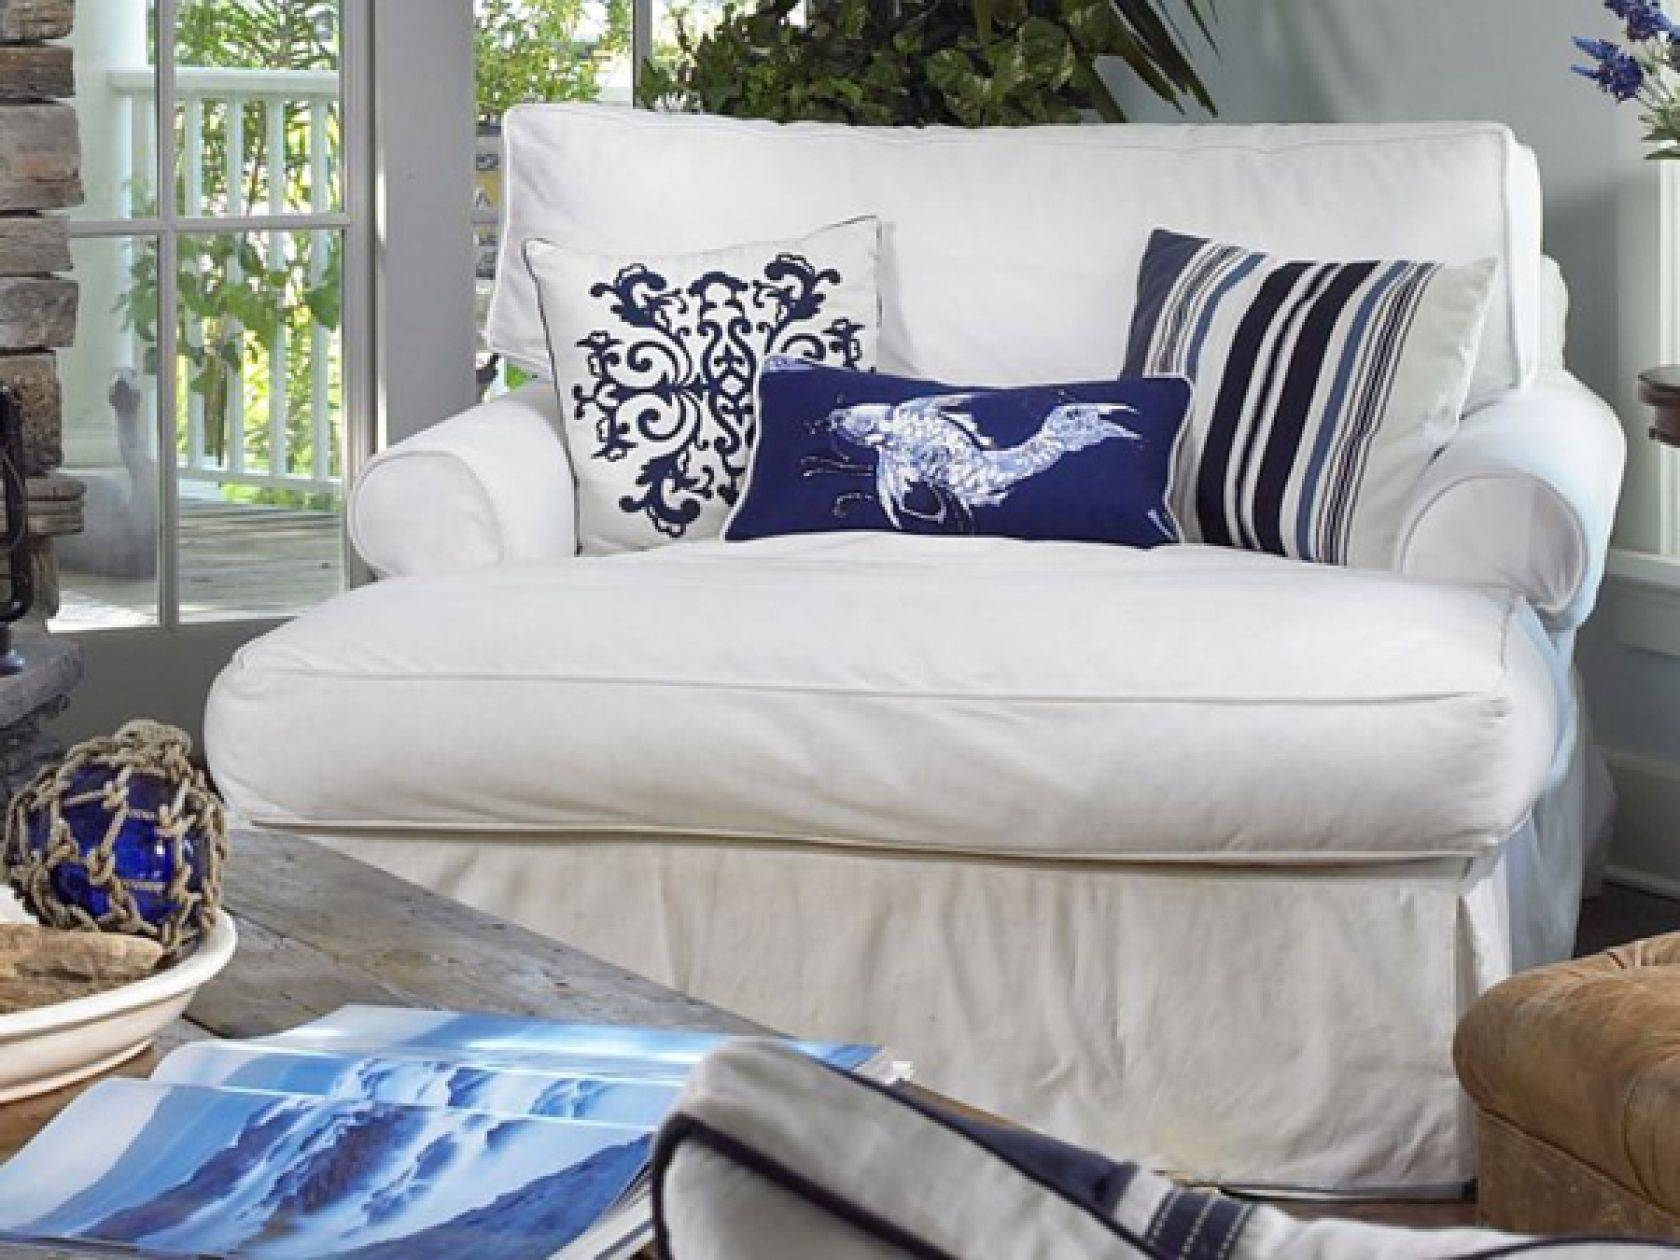 Interior Design Washable Slipcovered Sofas Washable Slipcovered in Washable Sofas (Image 7 of 30)